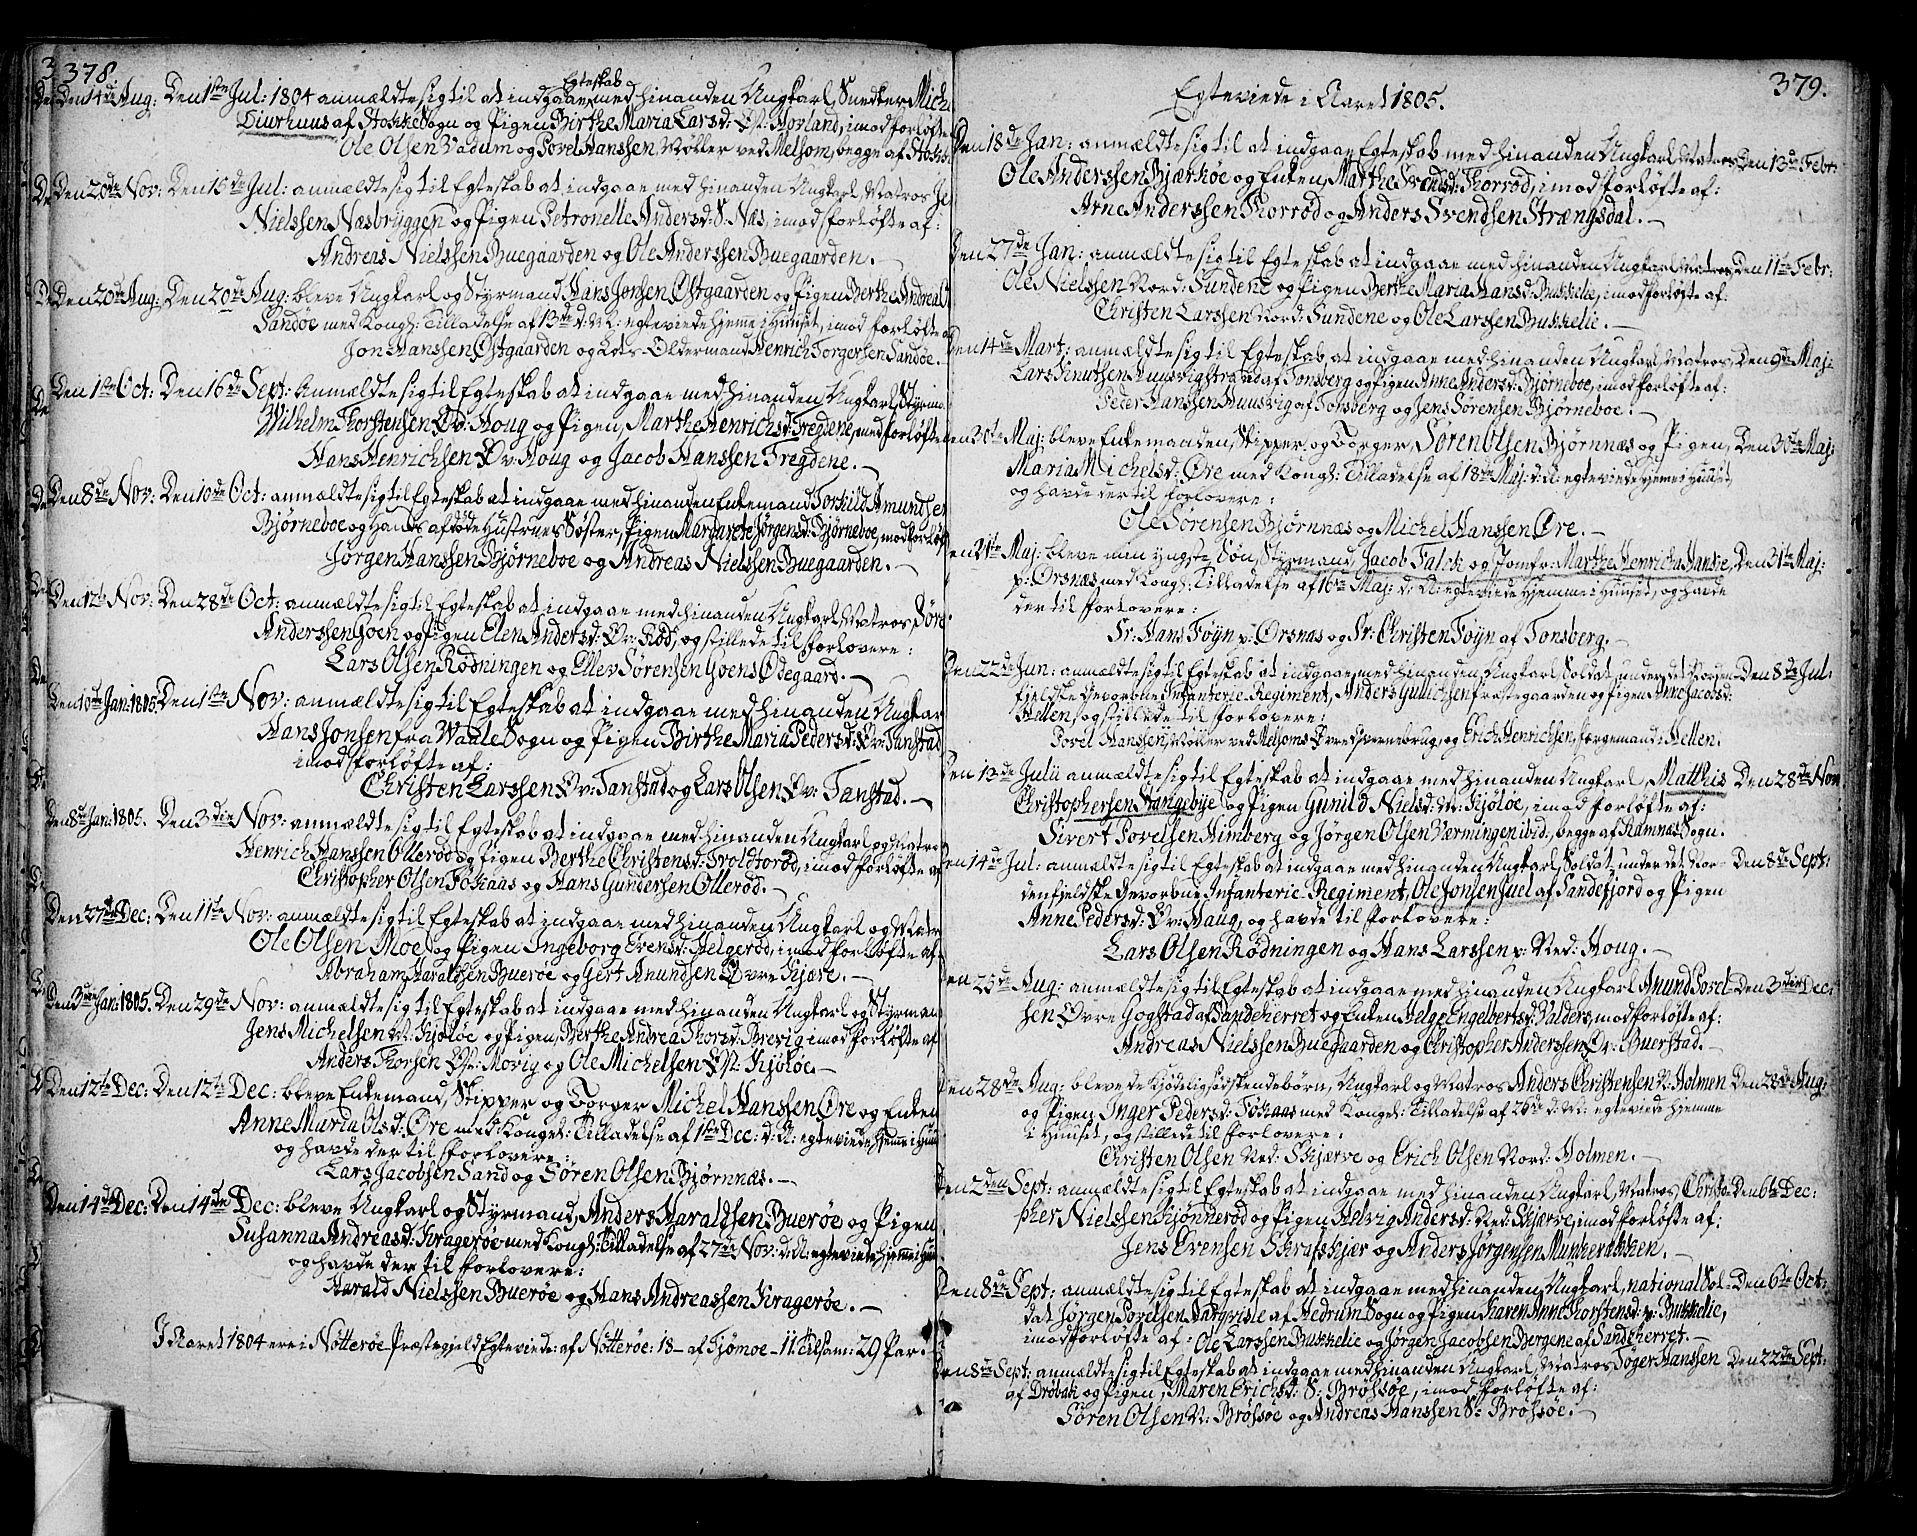 SAKO, Nøtterøy kirkebøker, F/Fa/L0003: Ministerialbok nr. I 3, 1791-1814, s. 378-379